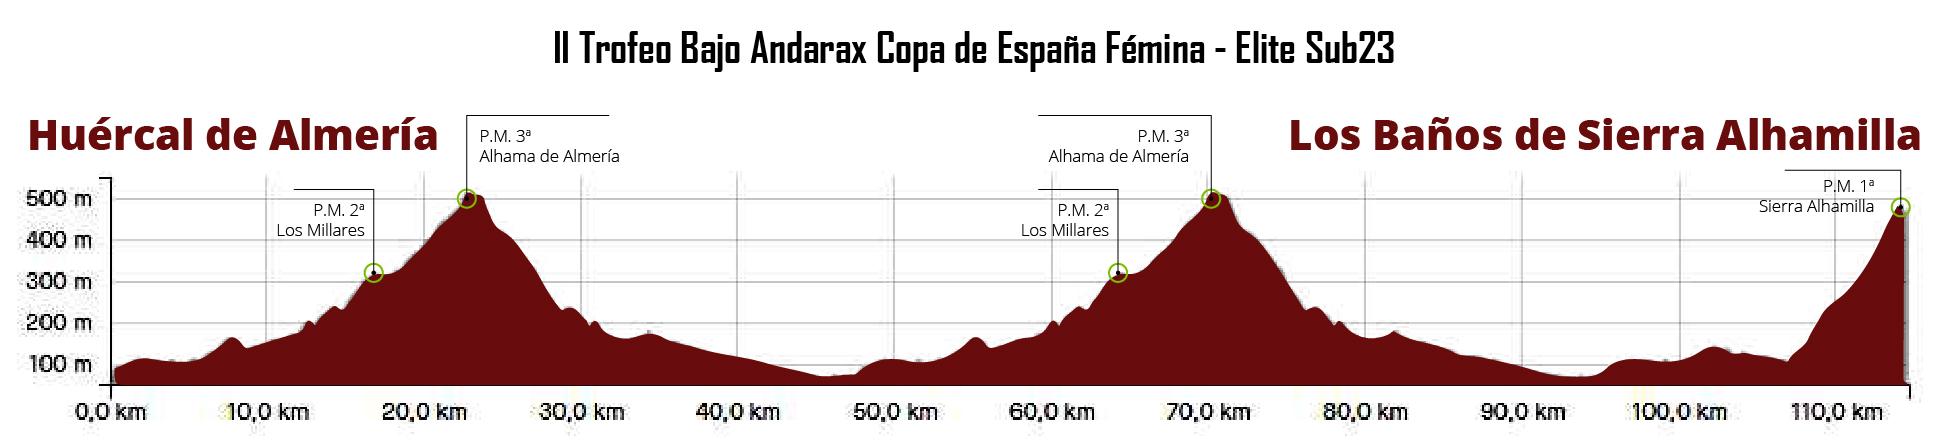 CopaEspañaCofidis_perfil